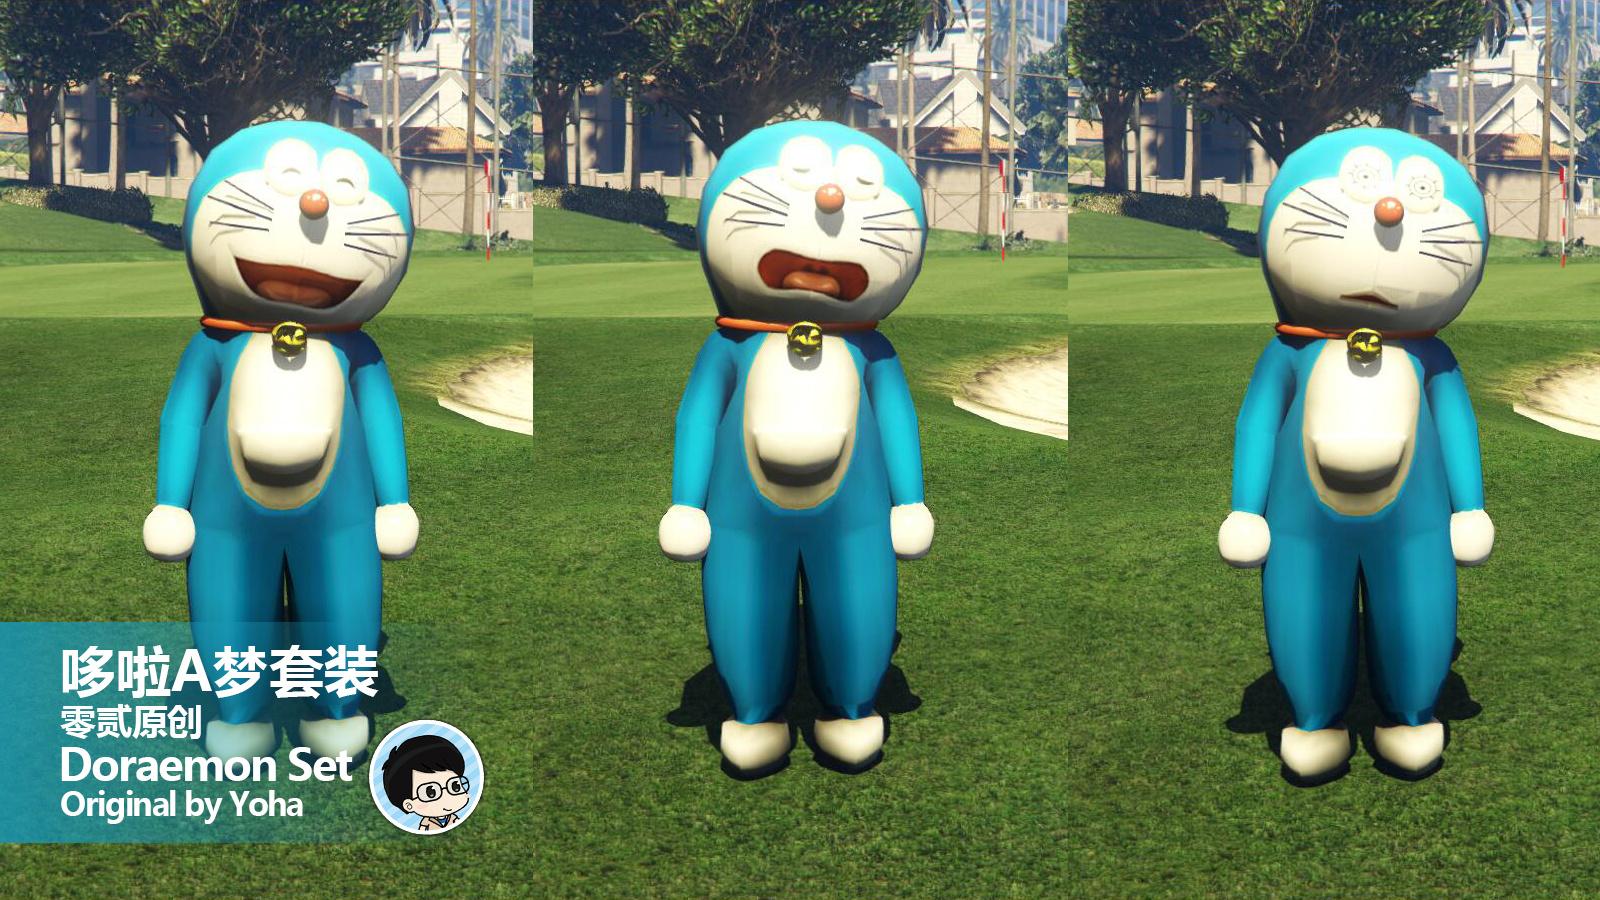 Fa Doraemon